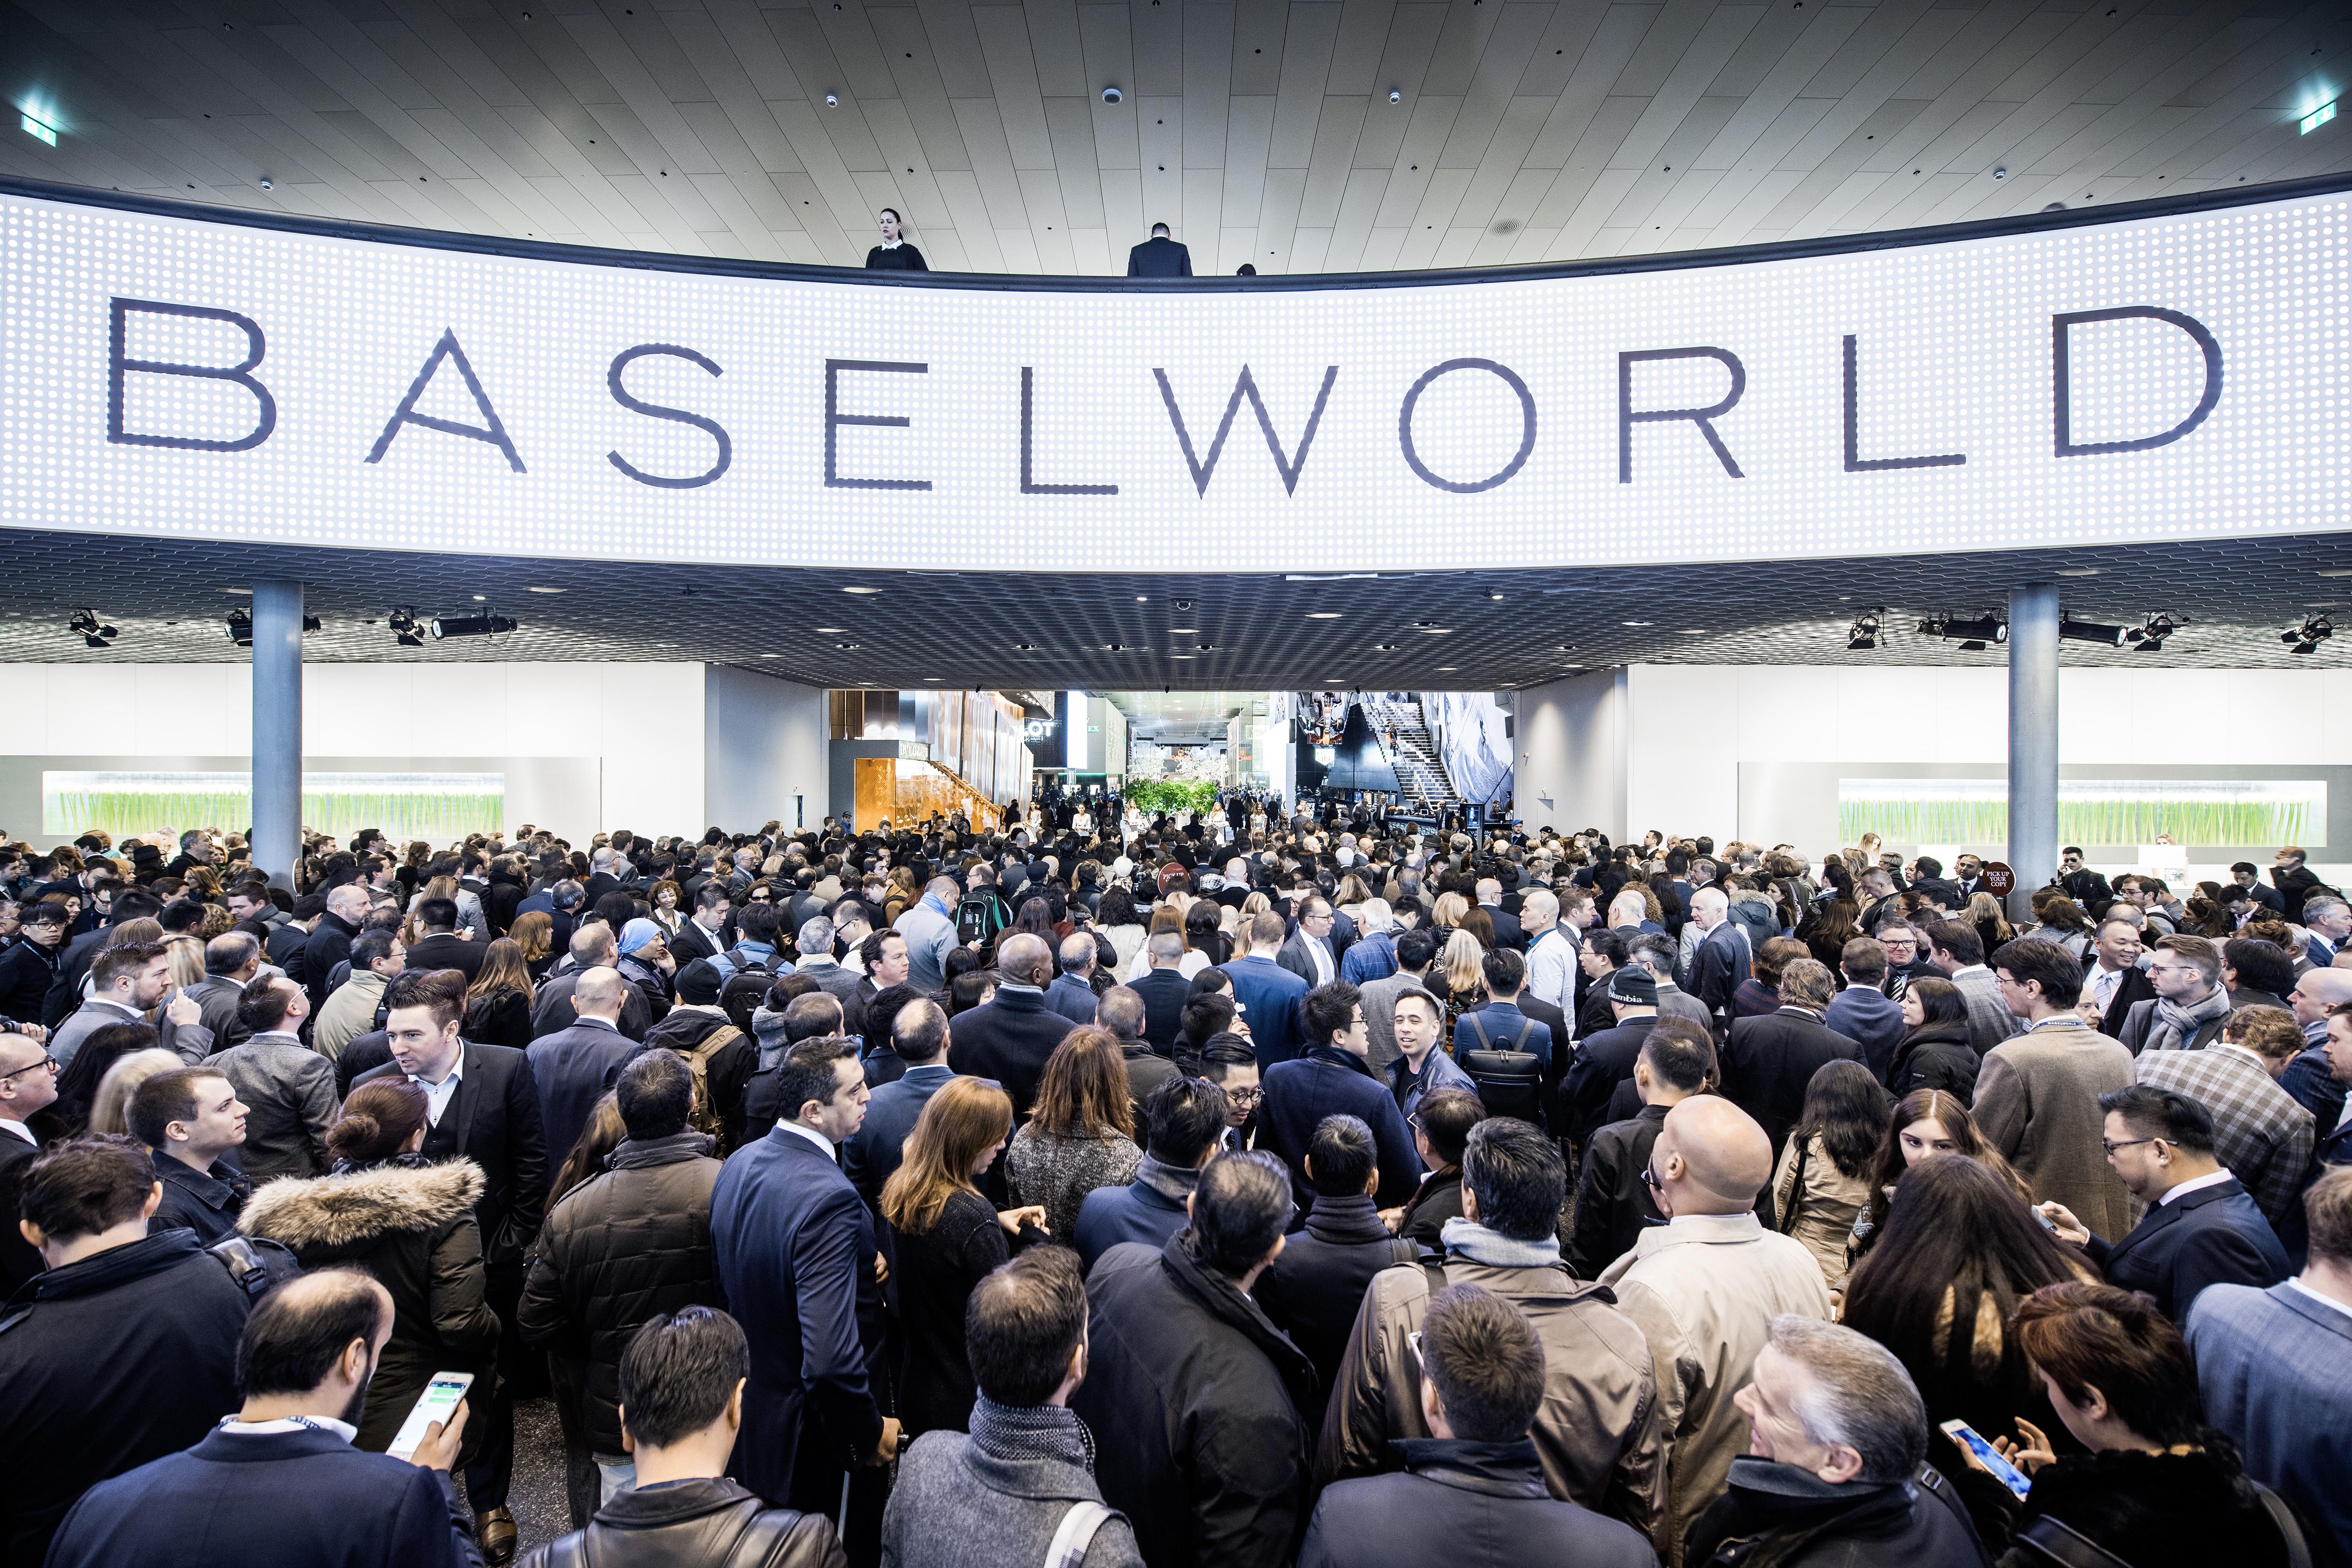 Baselworld